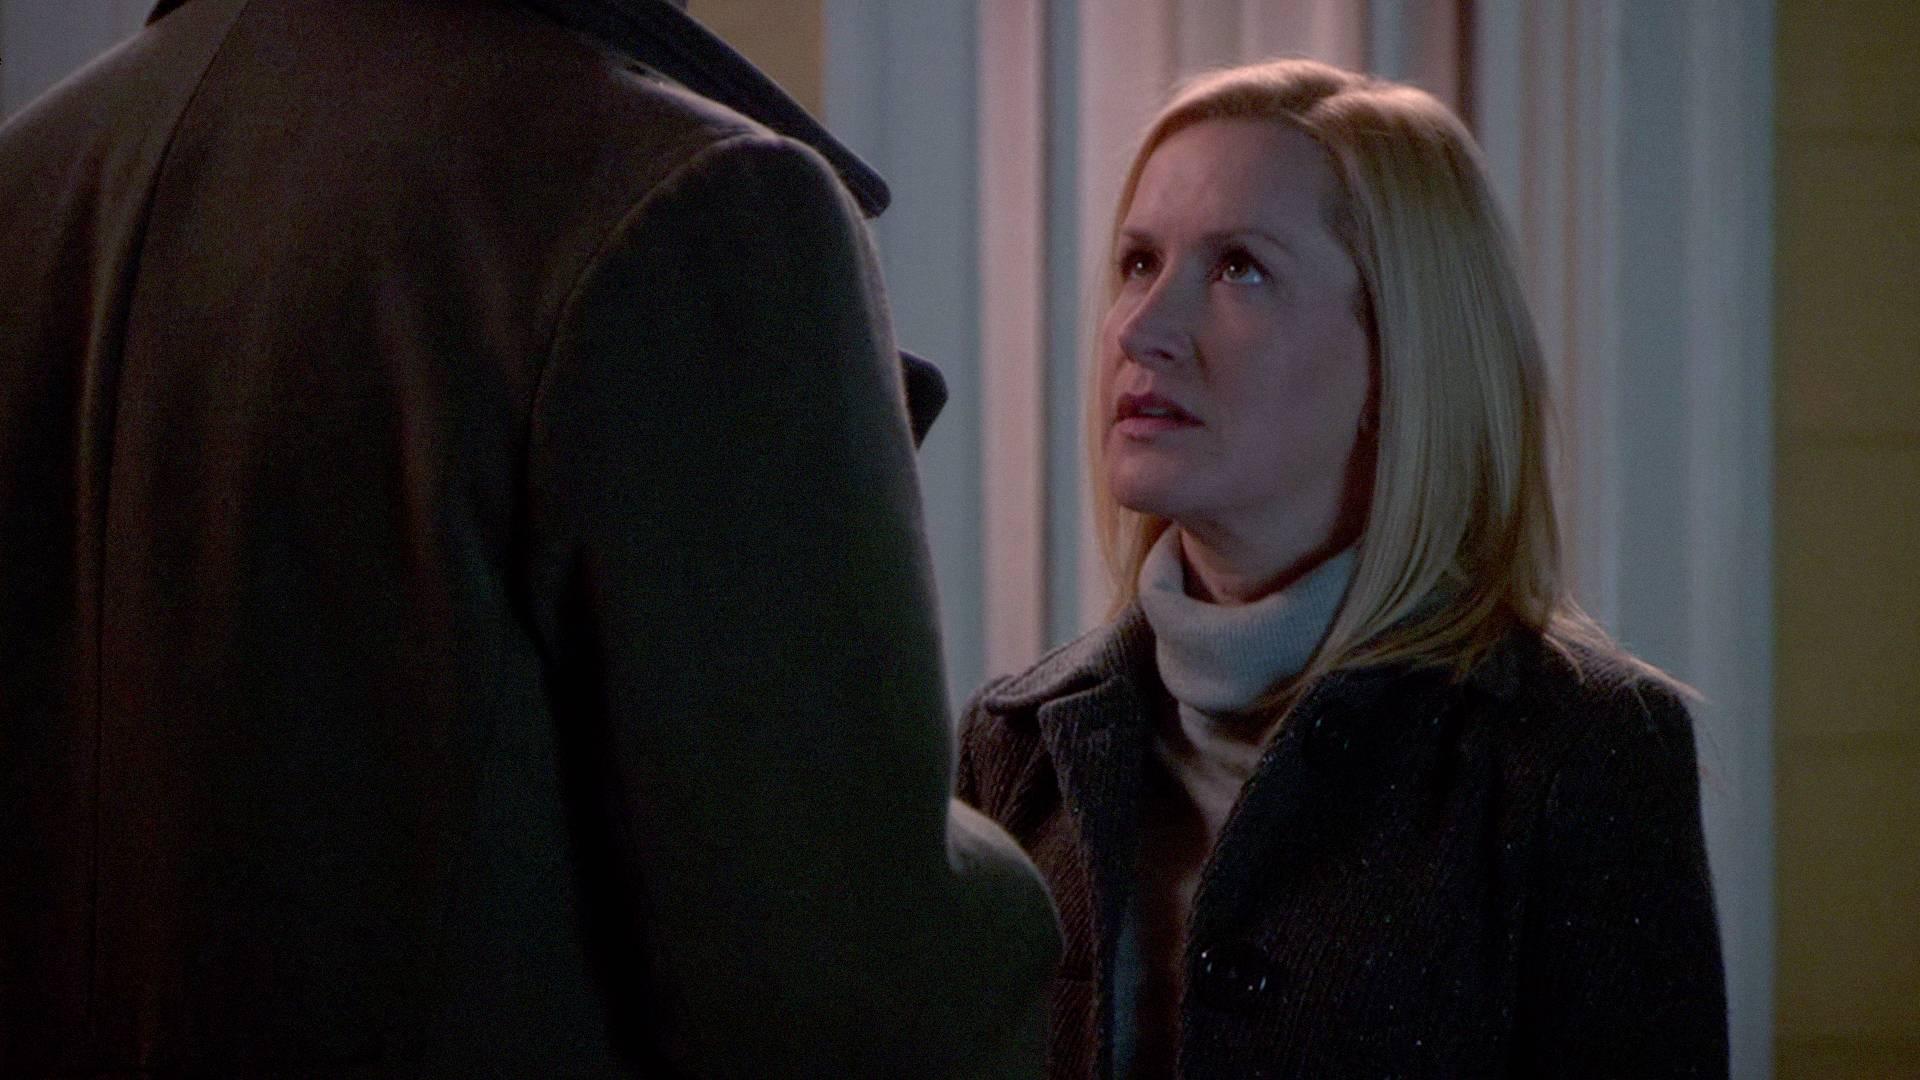 The Office Season 9 Episode 17